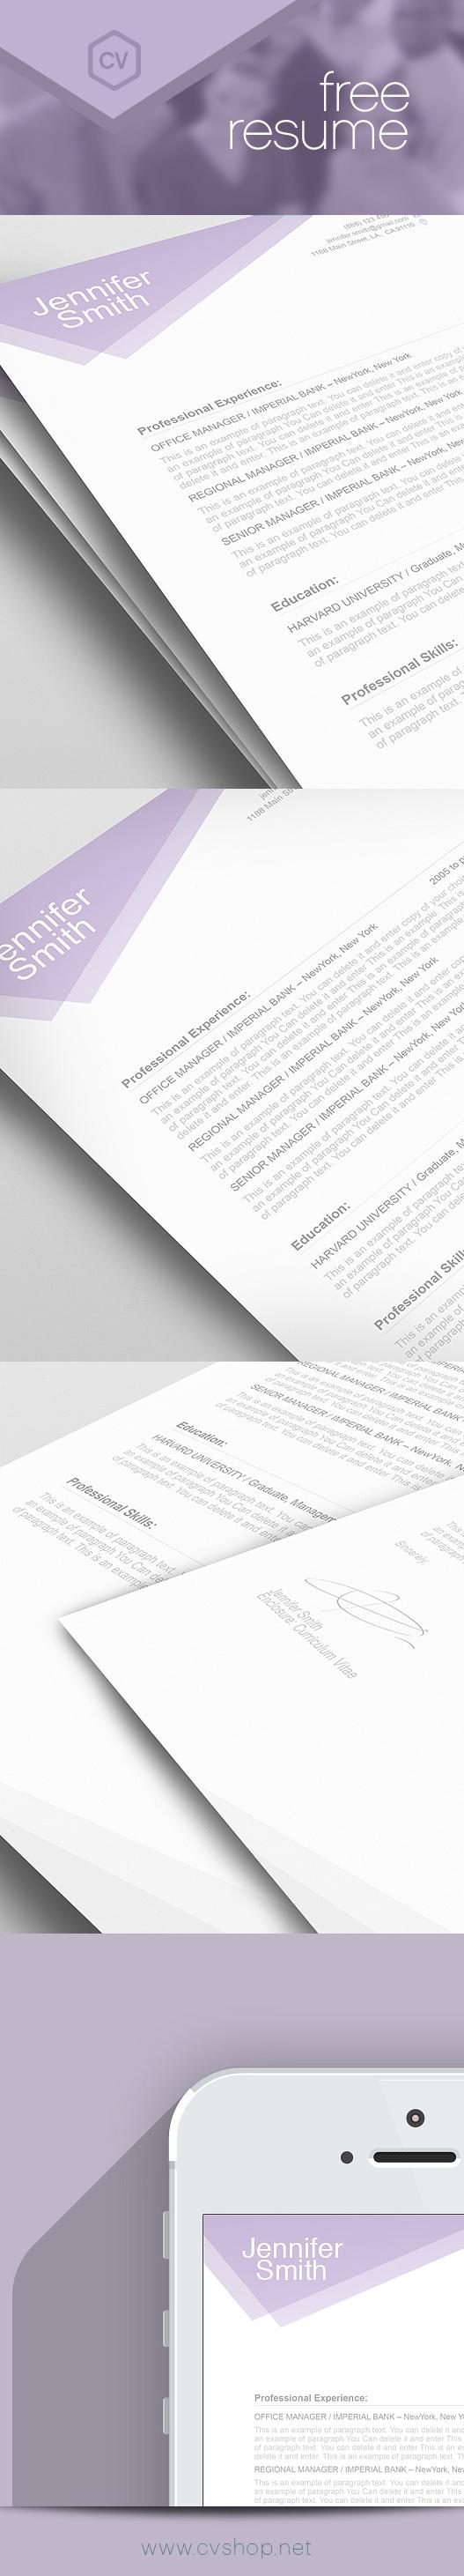 Resume Template 100030 Free Resume Templates